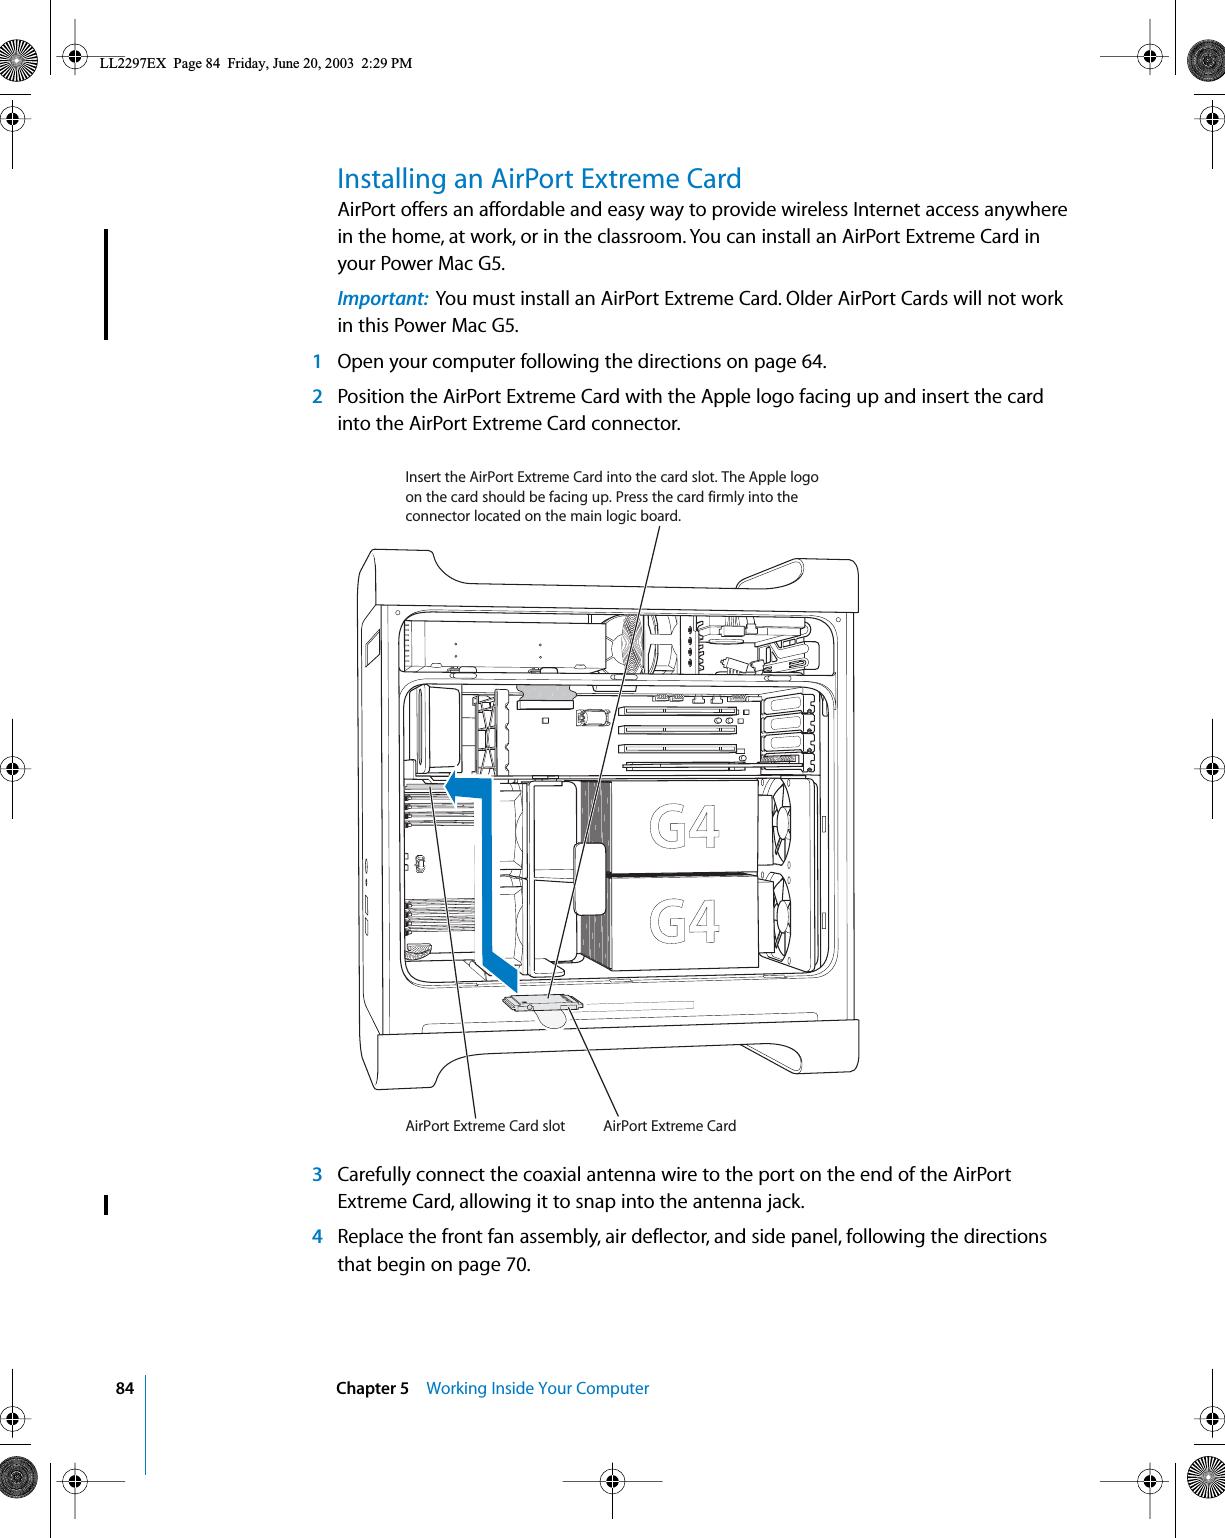 Internet Antenna Wiring Diagram Wire Connector Tv Wifi On Apple A1026 80211 B G Wireless Lan Module User Manual Installation